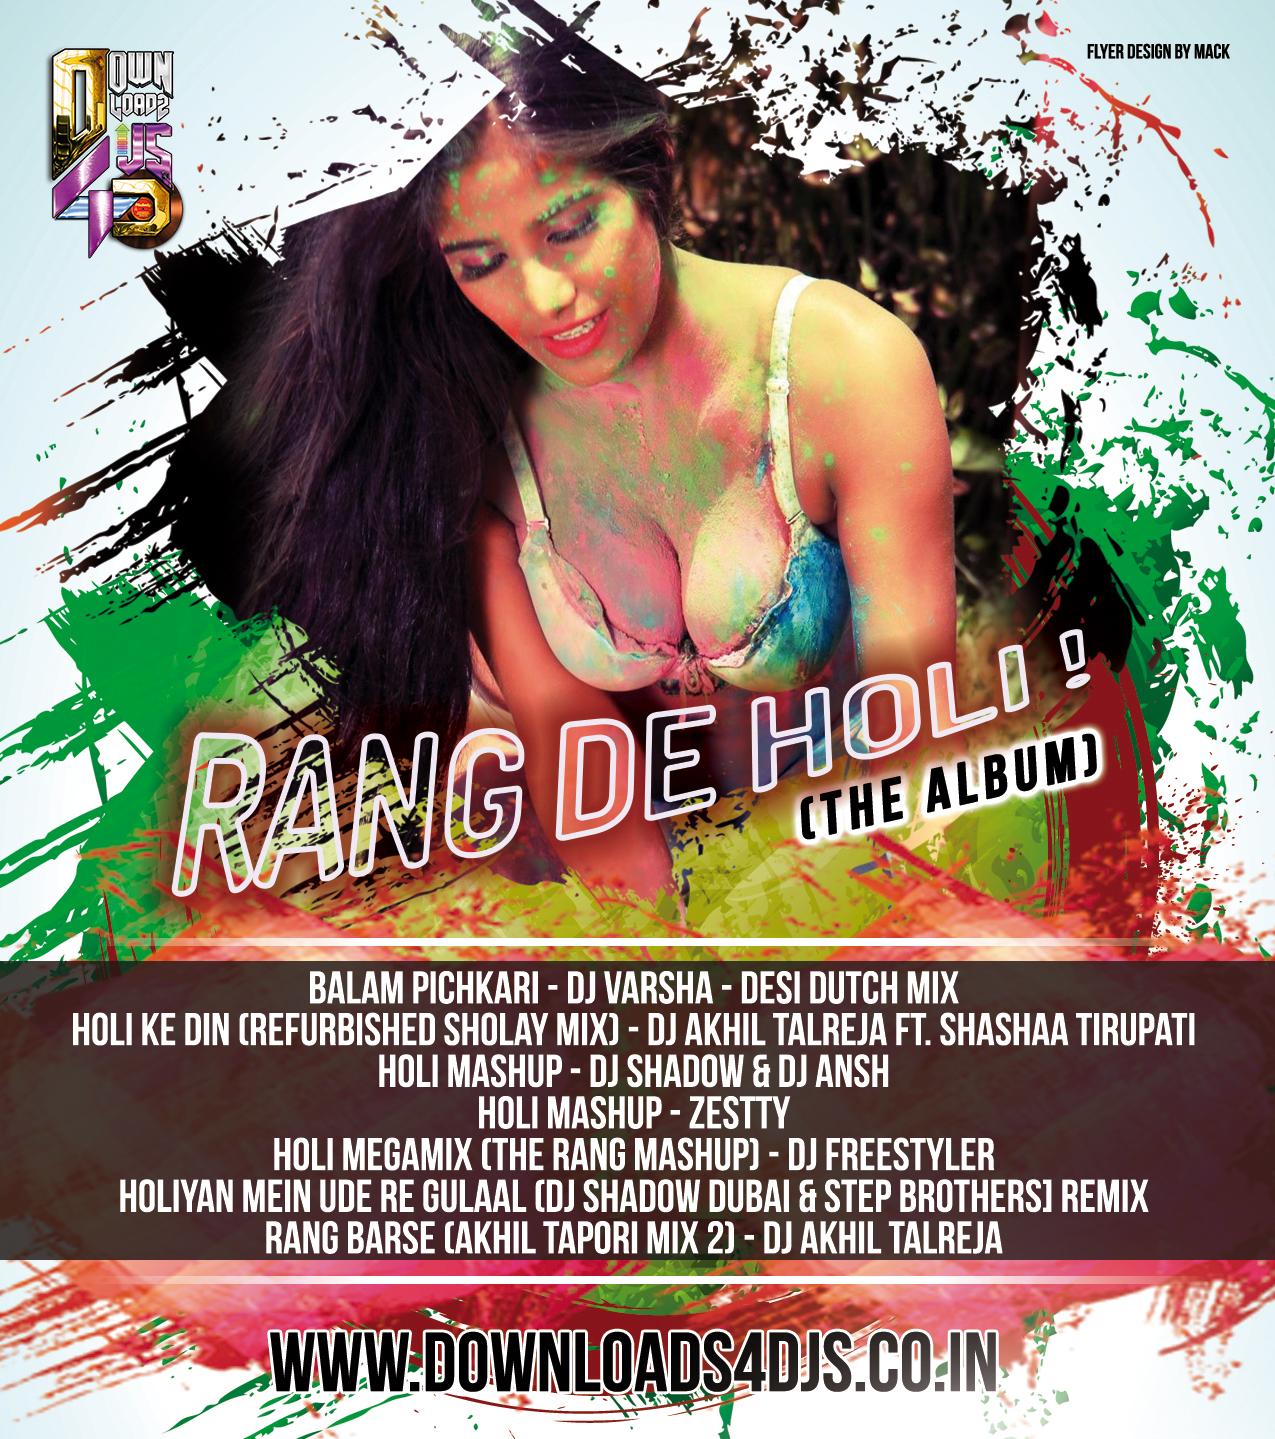 Leja Re Songs Doun Mobi: Holi Dj Mix Mp3 Songs Download